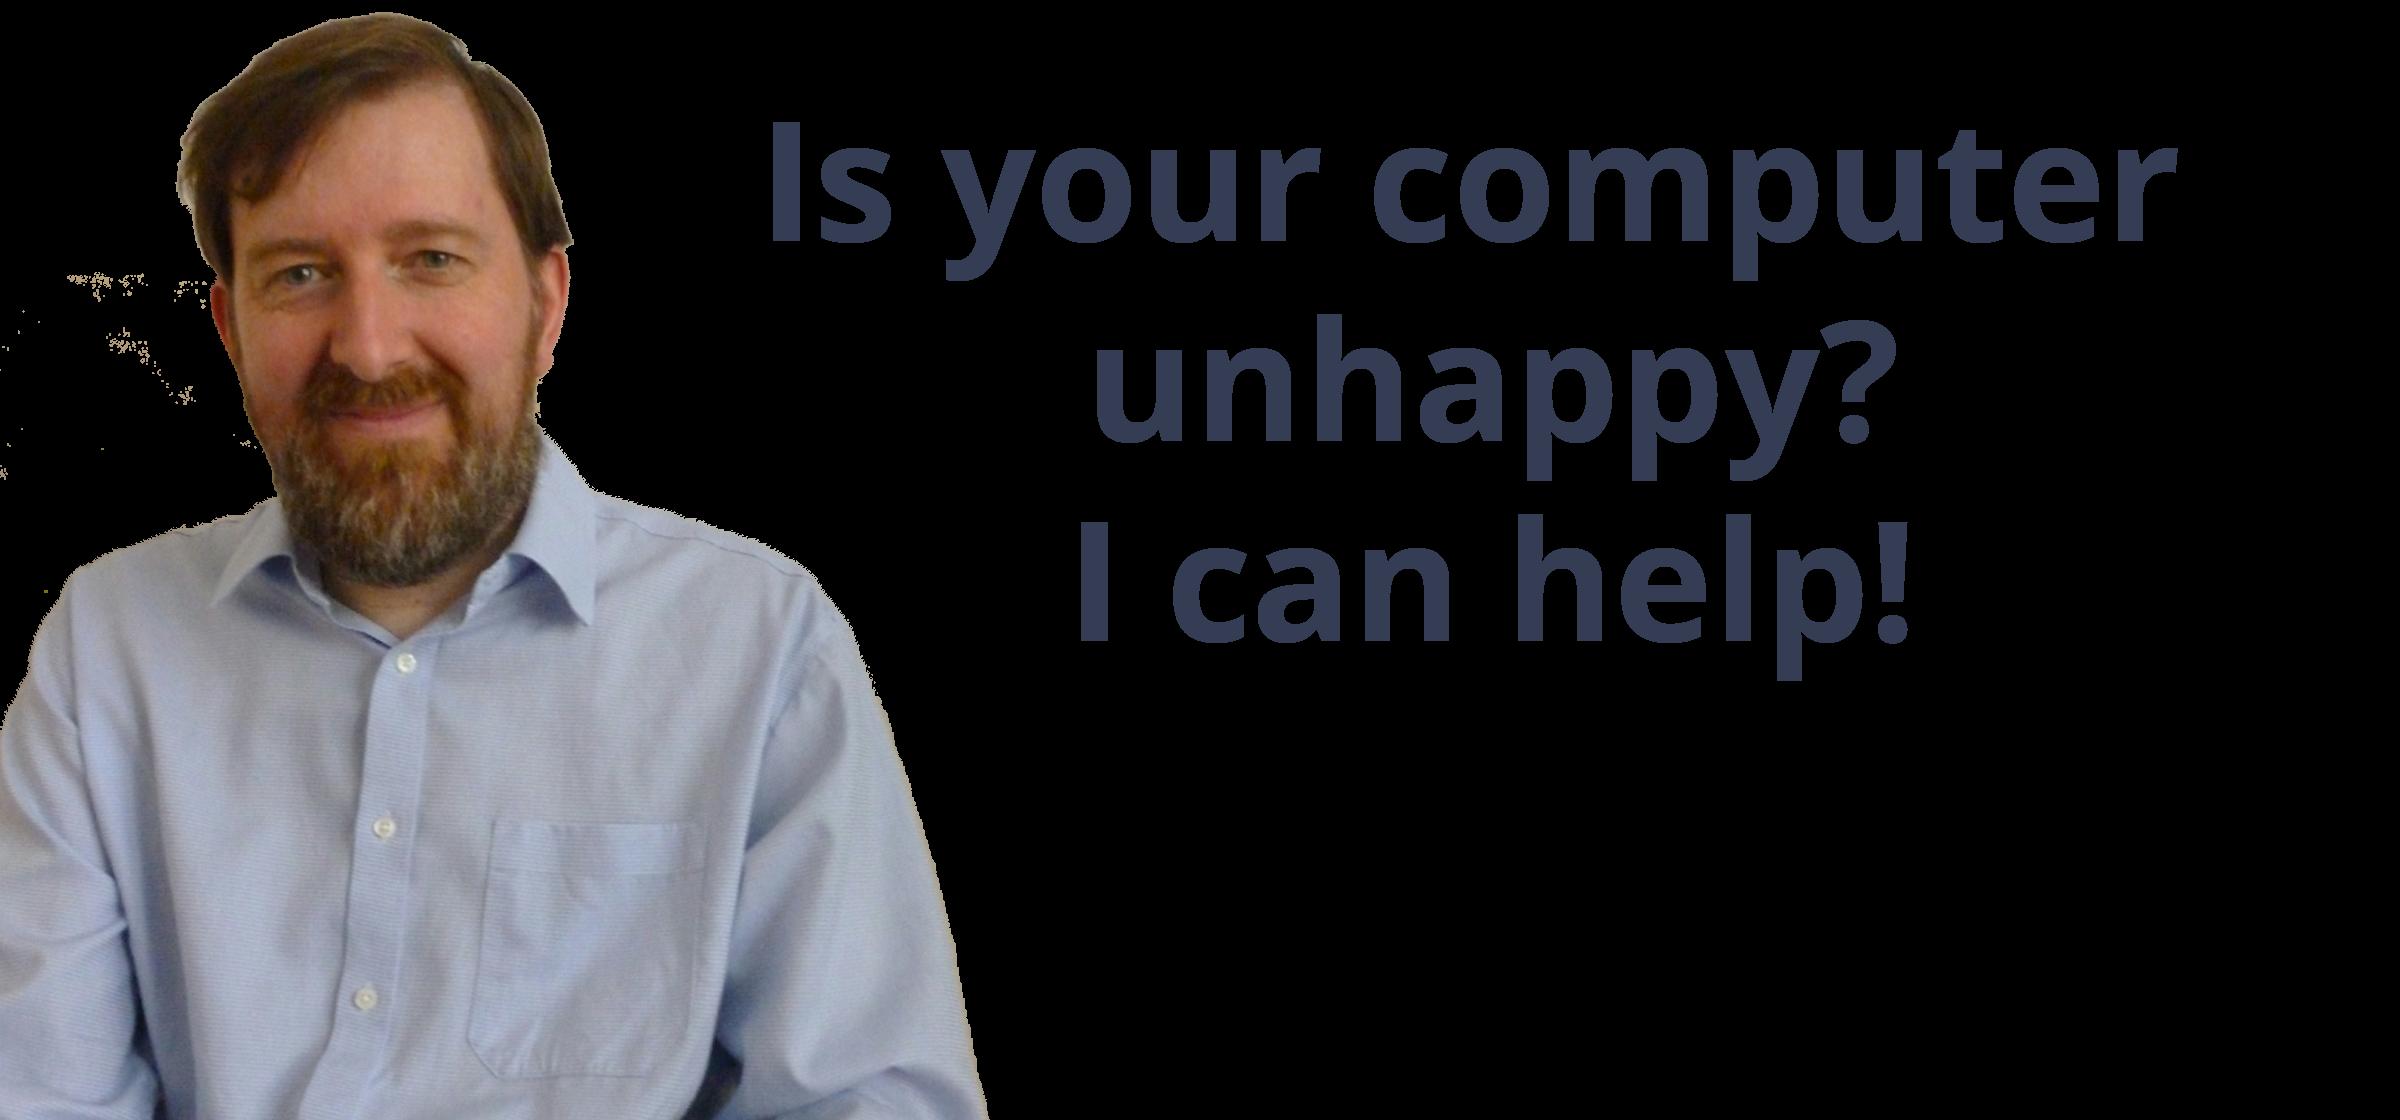 Jim Fernbank: Computer support in London